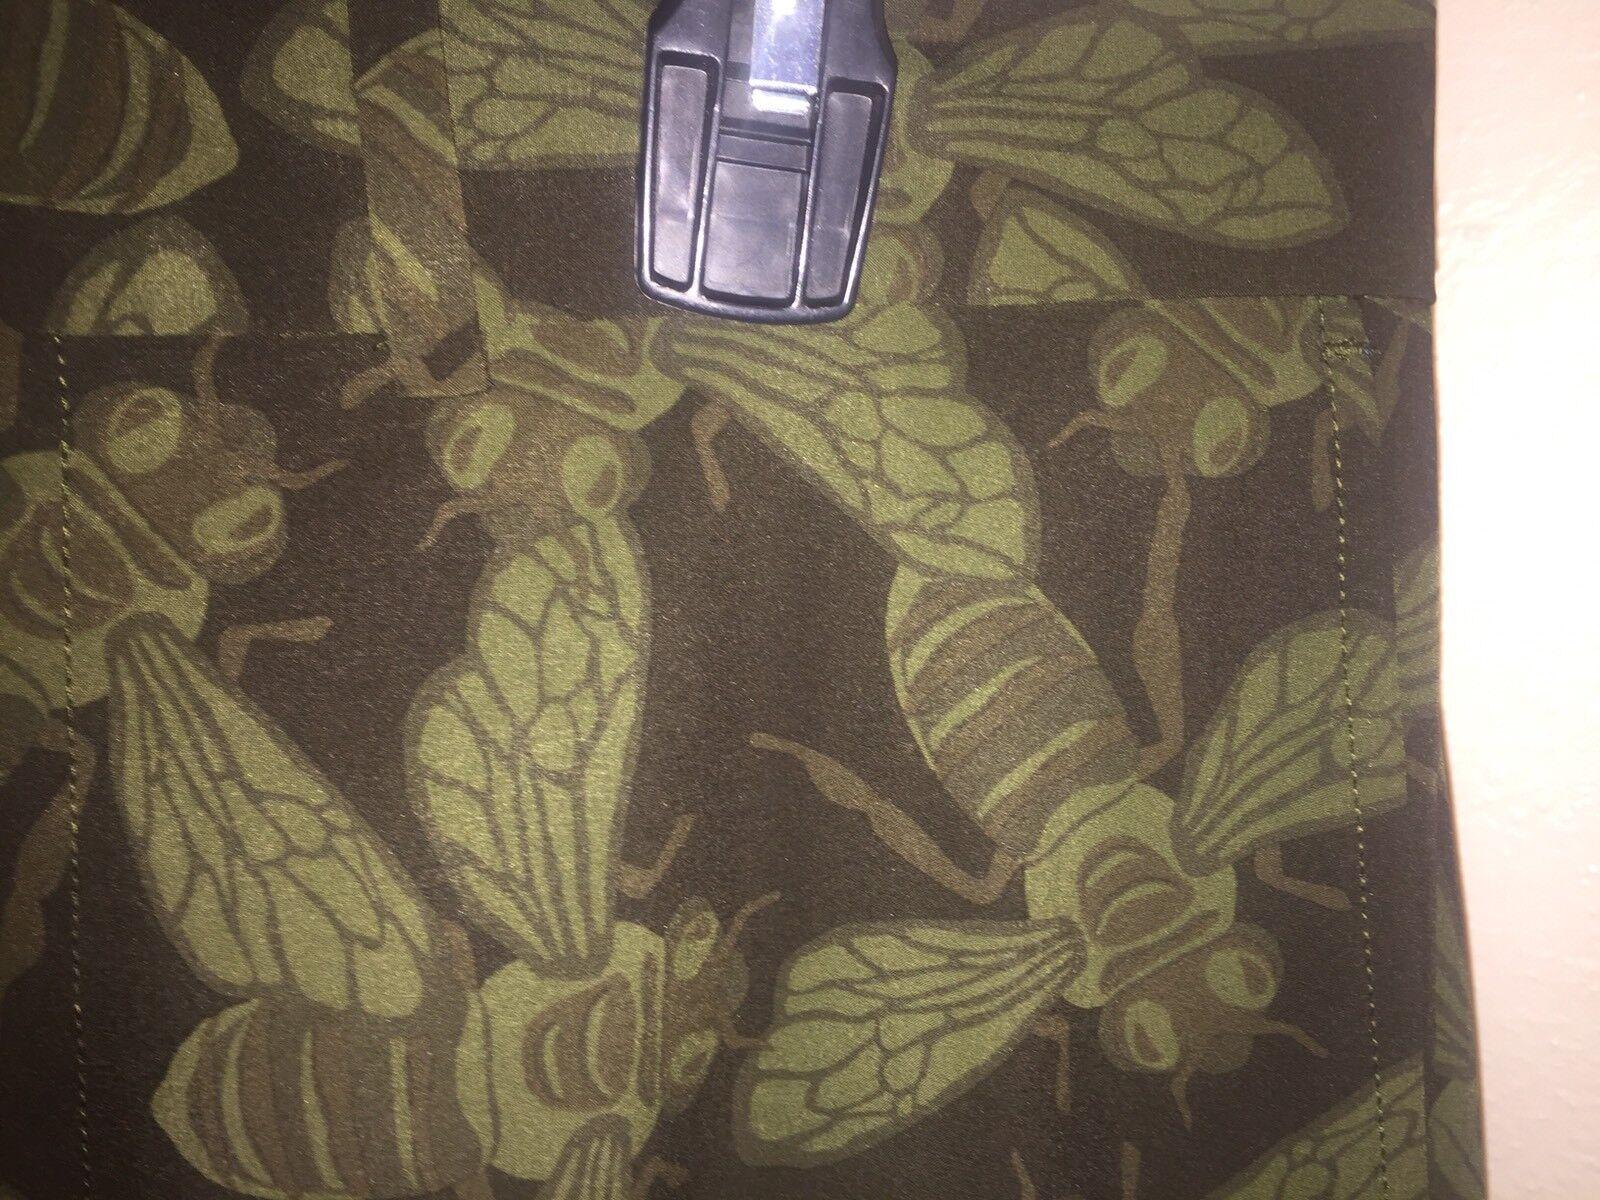 a870d4c3c23e3 Mens Ralph Lauren RLX Golf Insect Camo Printed Shorts Sz 33 for sale online    eBay